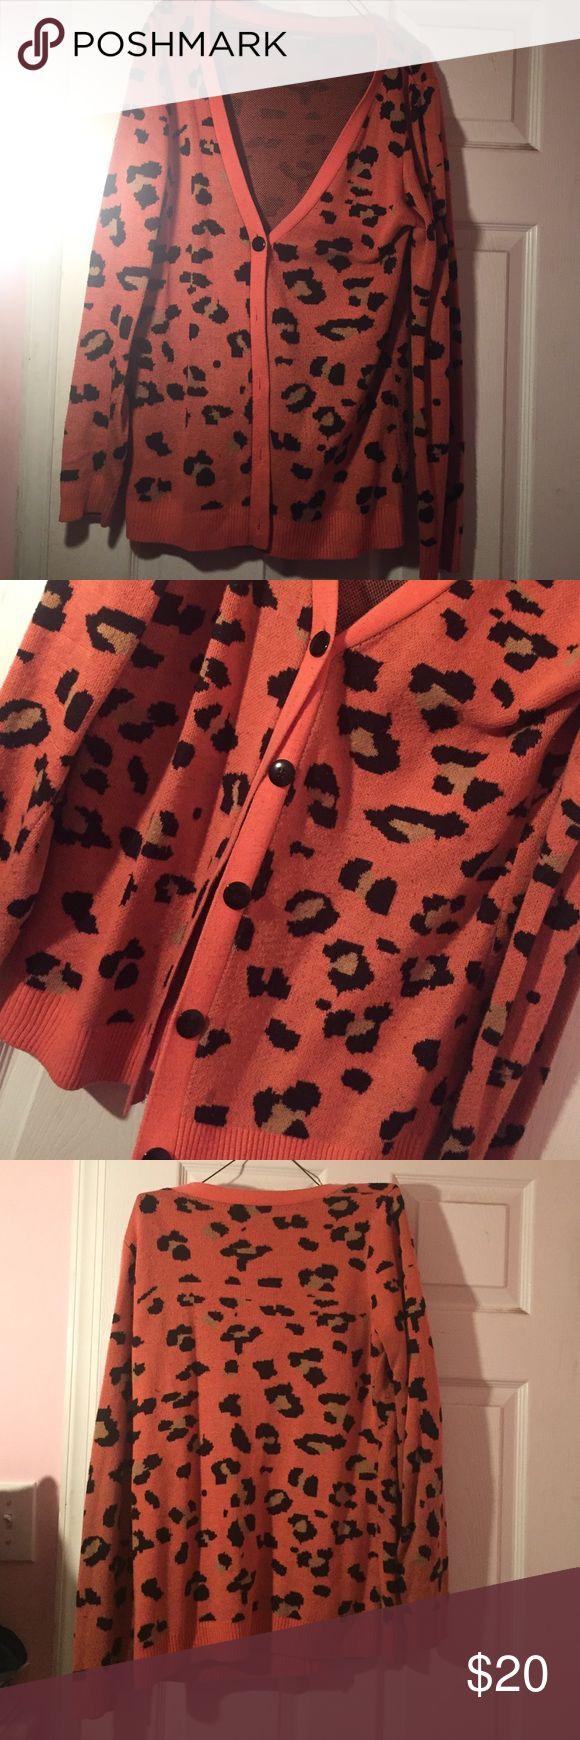 Cheetah cardigan. Cute & cozy cardigan. Pretty warm. Worn but still in good condition. Charlotte Russe Sweaters Cardigans